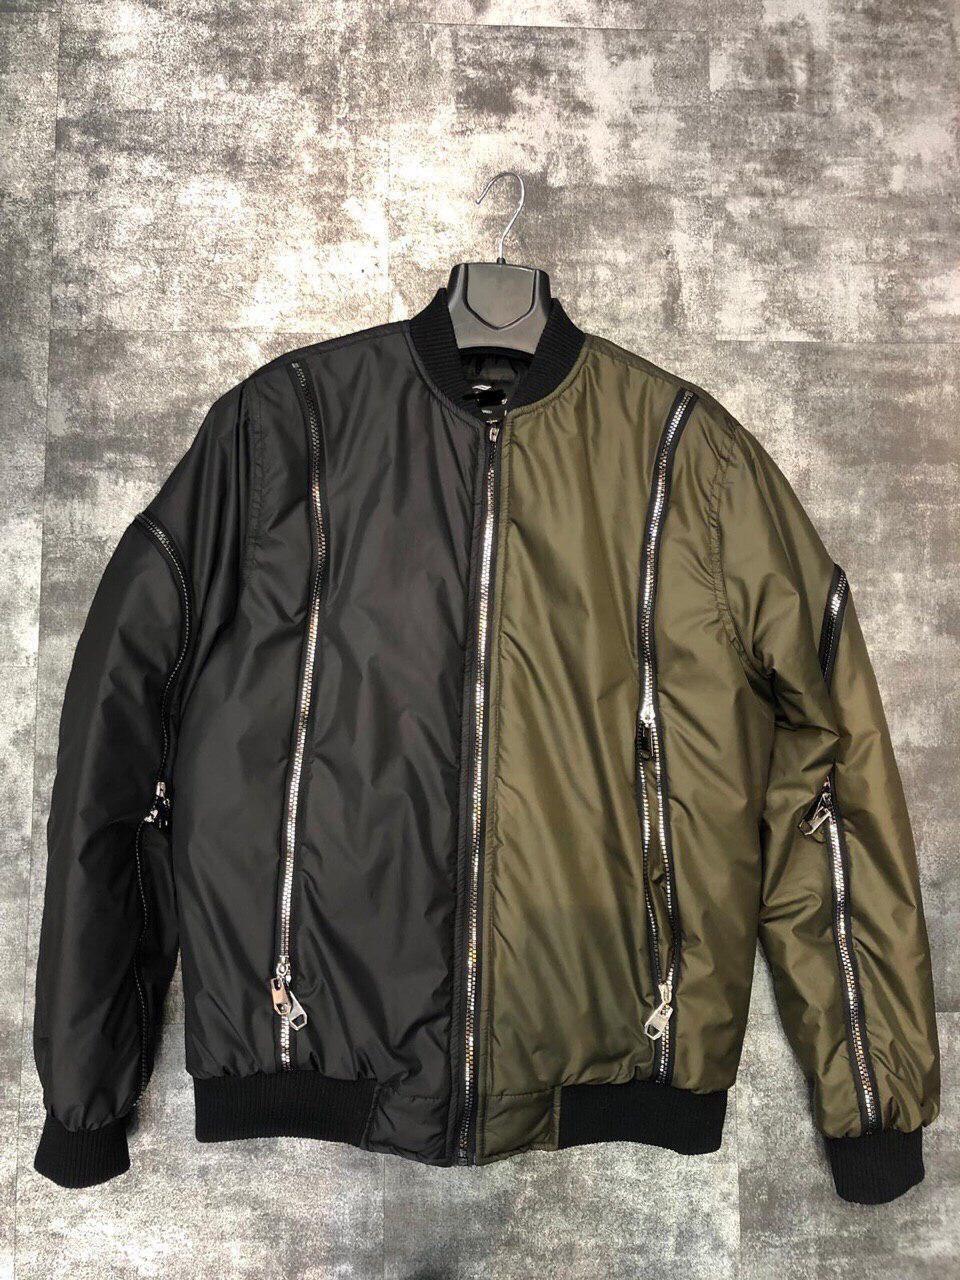 Бомбер - дизайнерская мужская куртка-бомбер